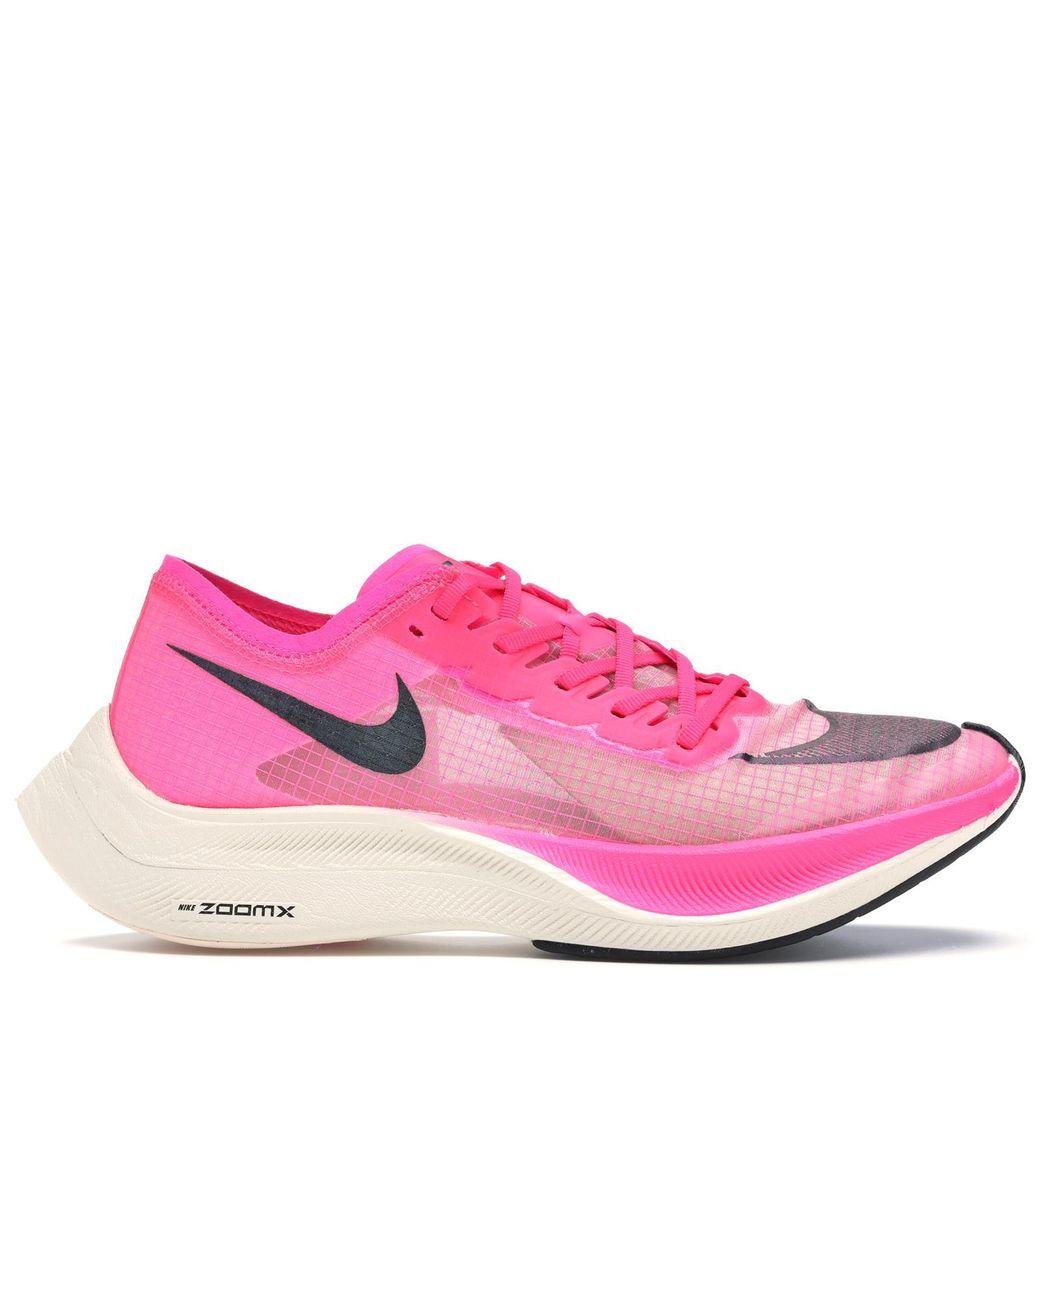 Nike Zoomx Vaporfly Next% Running Shoe in Black/Pink (Pink ...